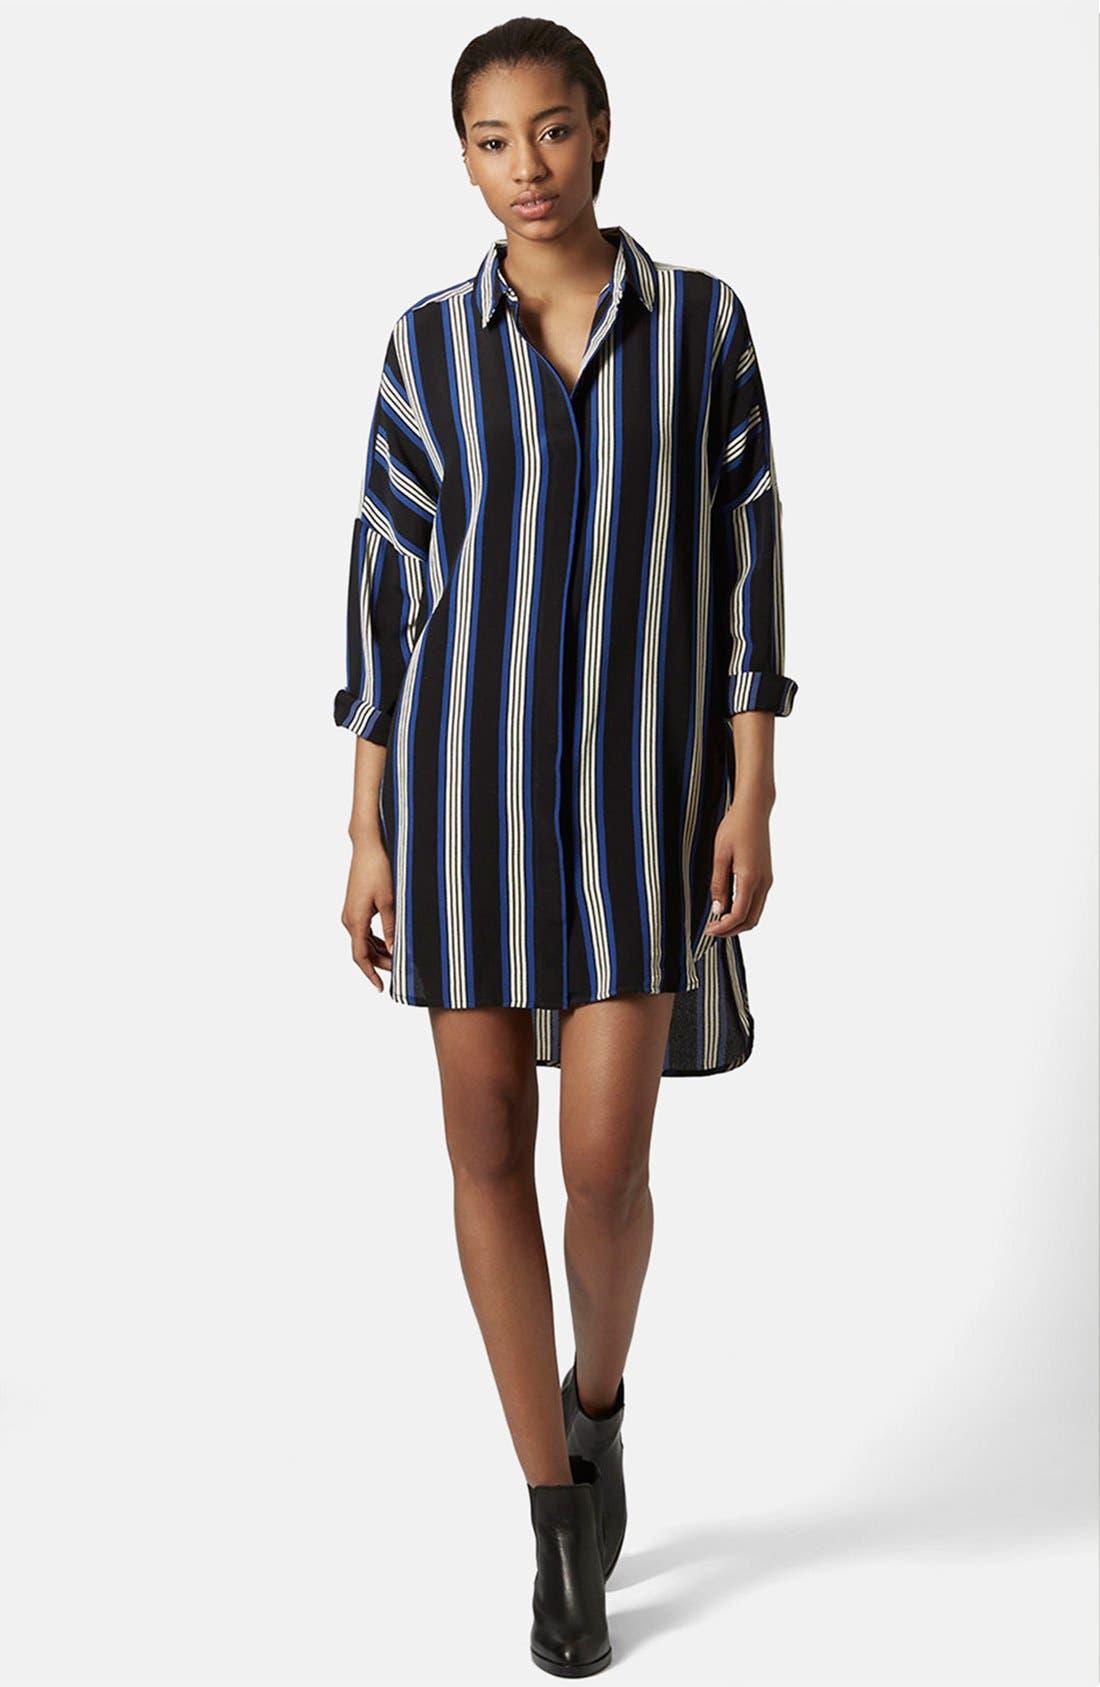 Alternate Image 1 Selected - Topshop 'Granddad' Stripe Shirtdress